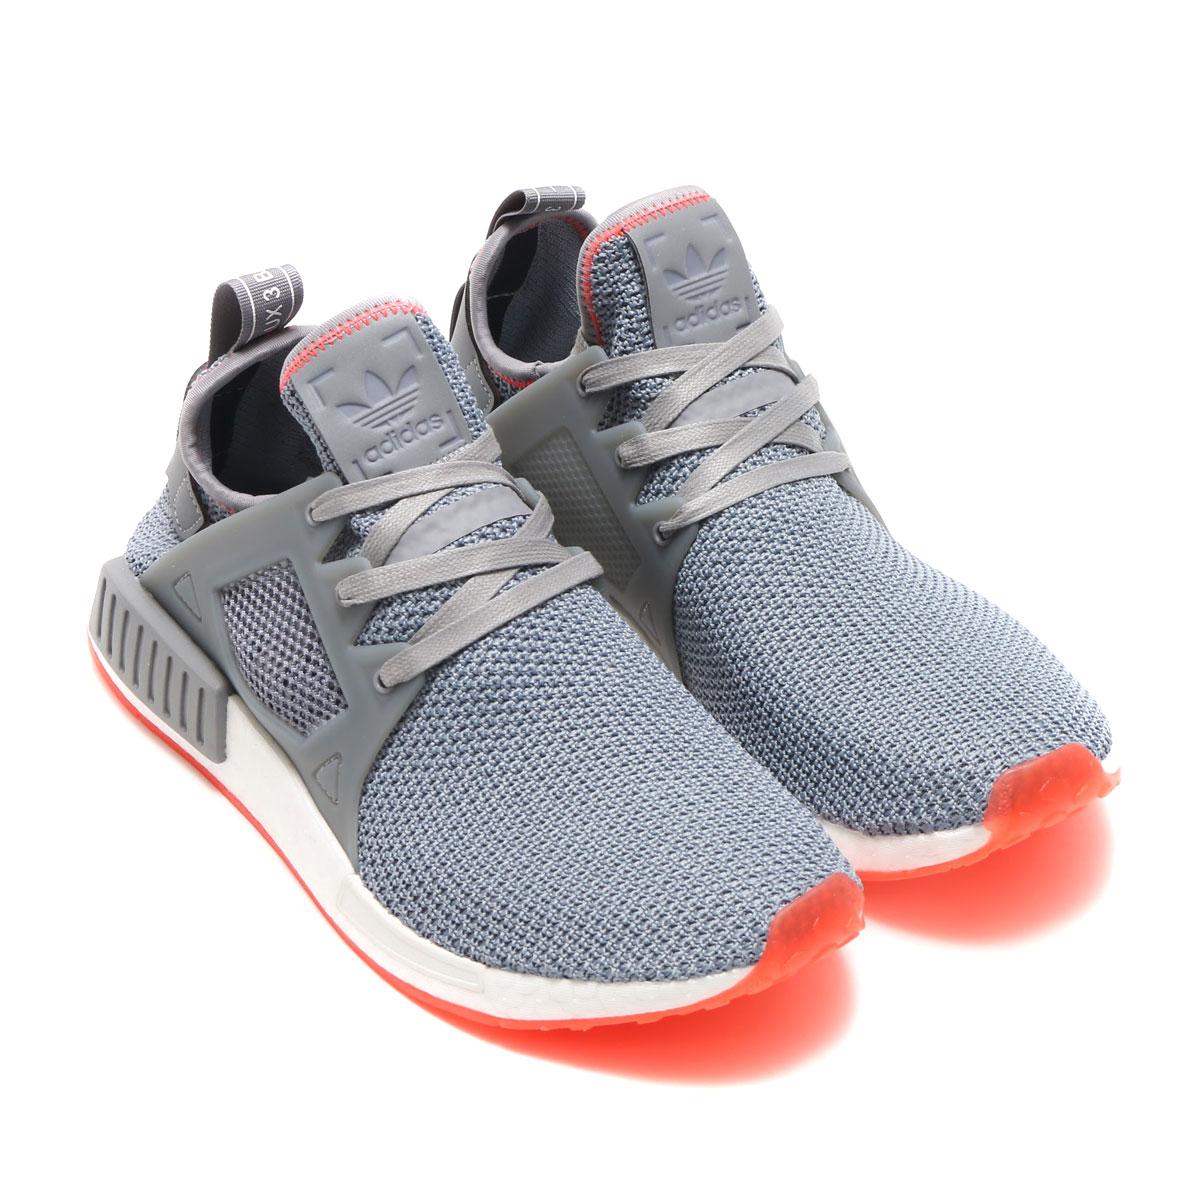 cheaper 6fac3 eea74 adidas Originals NMD XR1 (Adidas originals NMD XR1) Grey / Grey / Solar Red  17FW-I